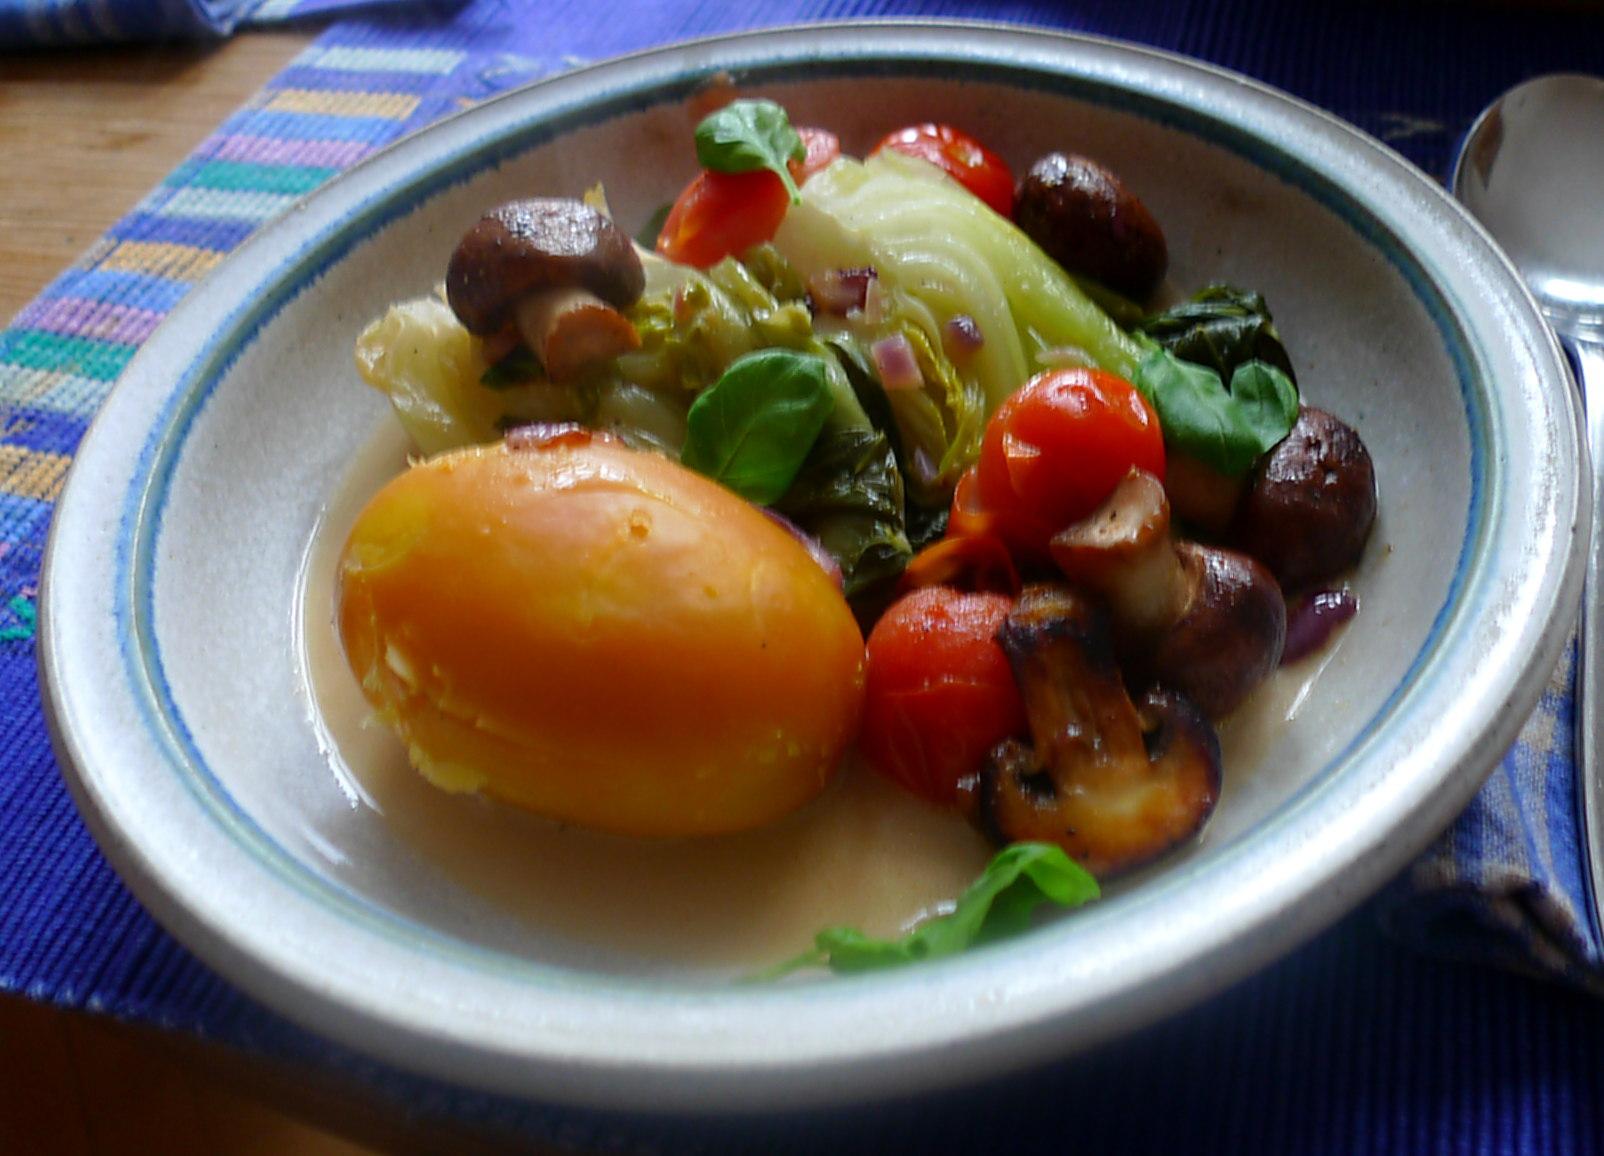 pak-choitomatenchampignonkartoffelnvegetarisch-15